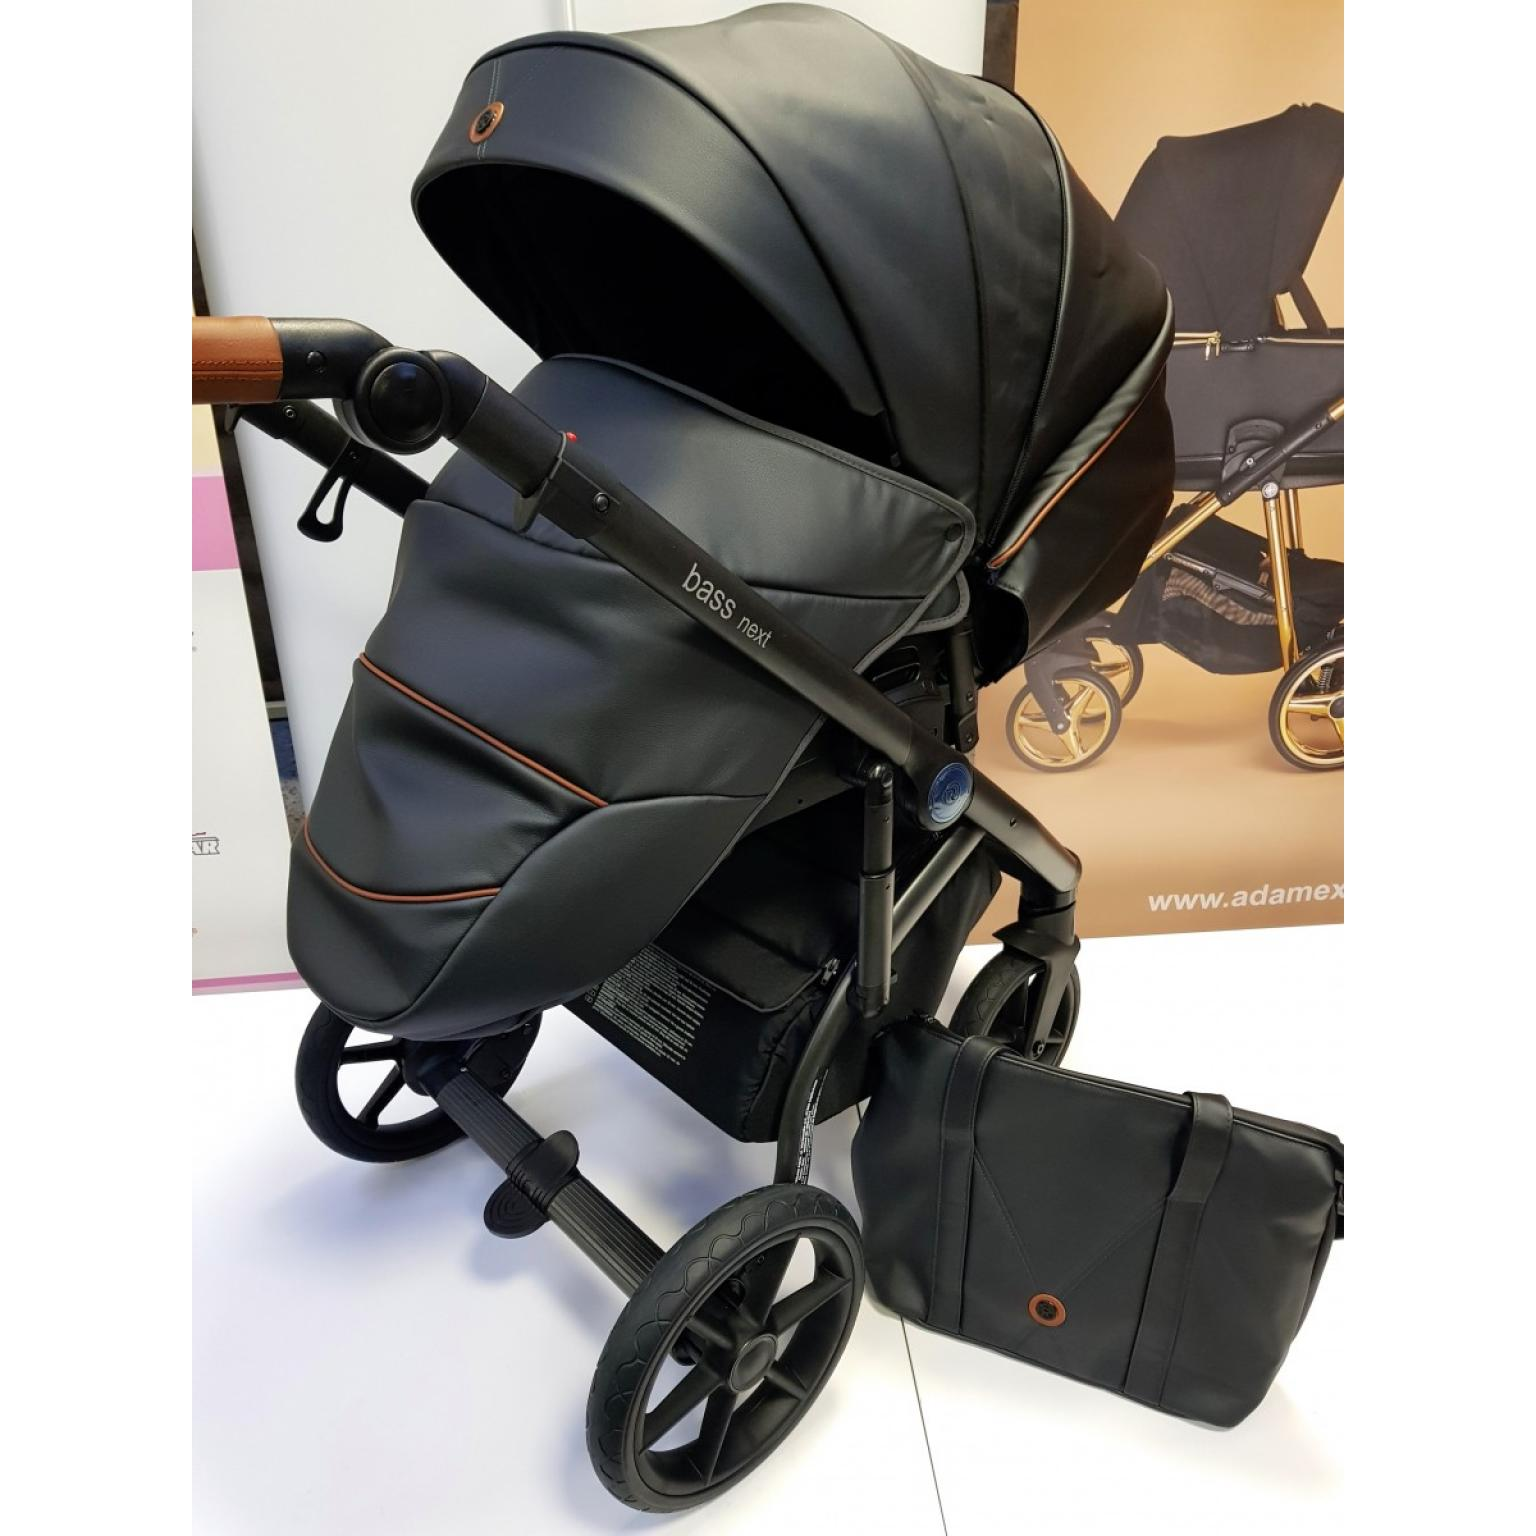 Bērnu-rati-ROAN-BASS-NEXT-ECO-ĀDA-black-детская-коляска-Roan-16